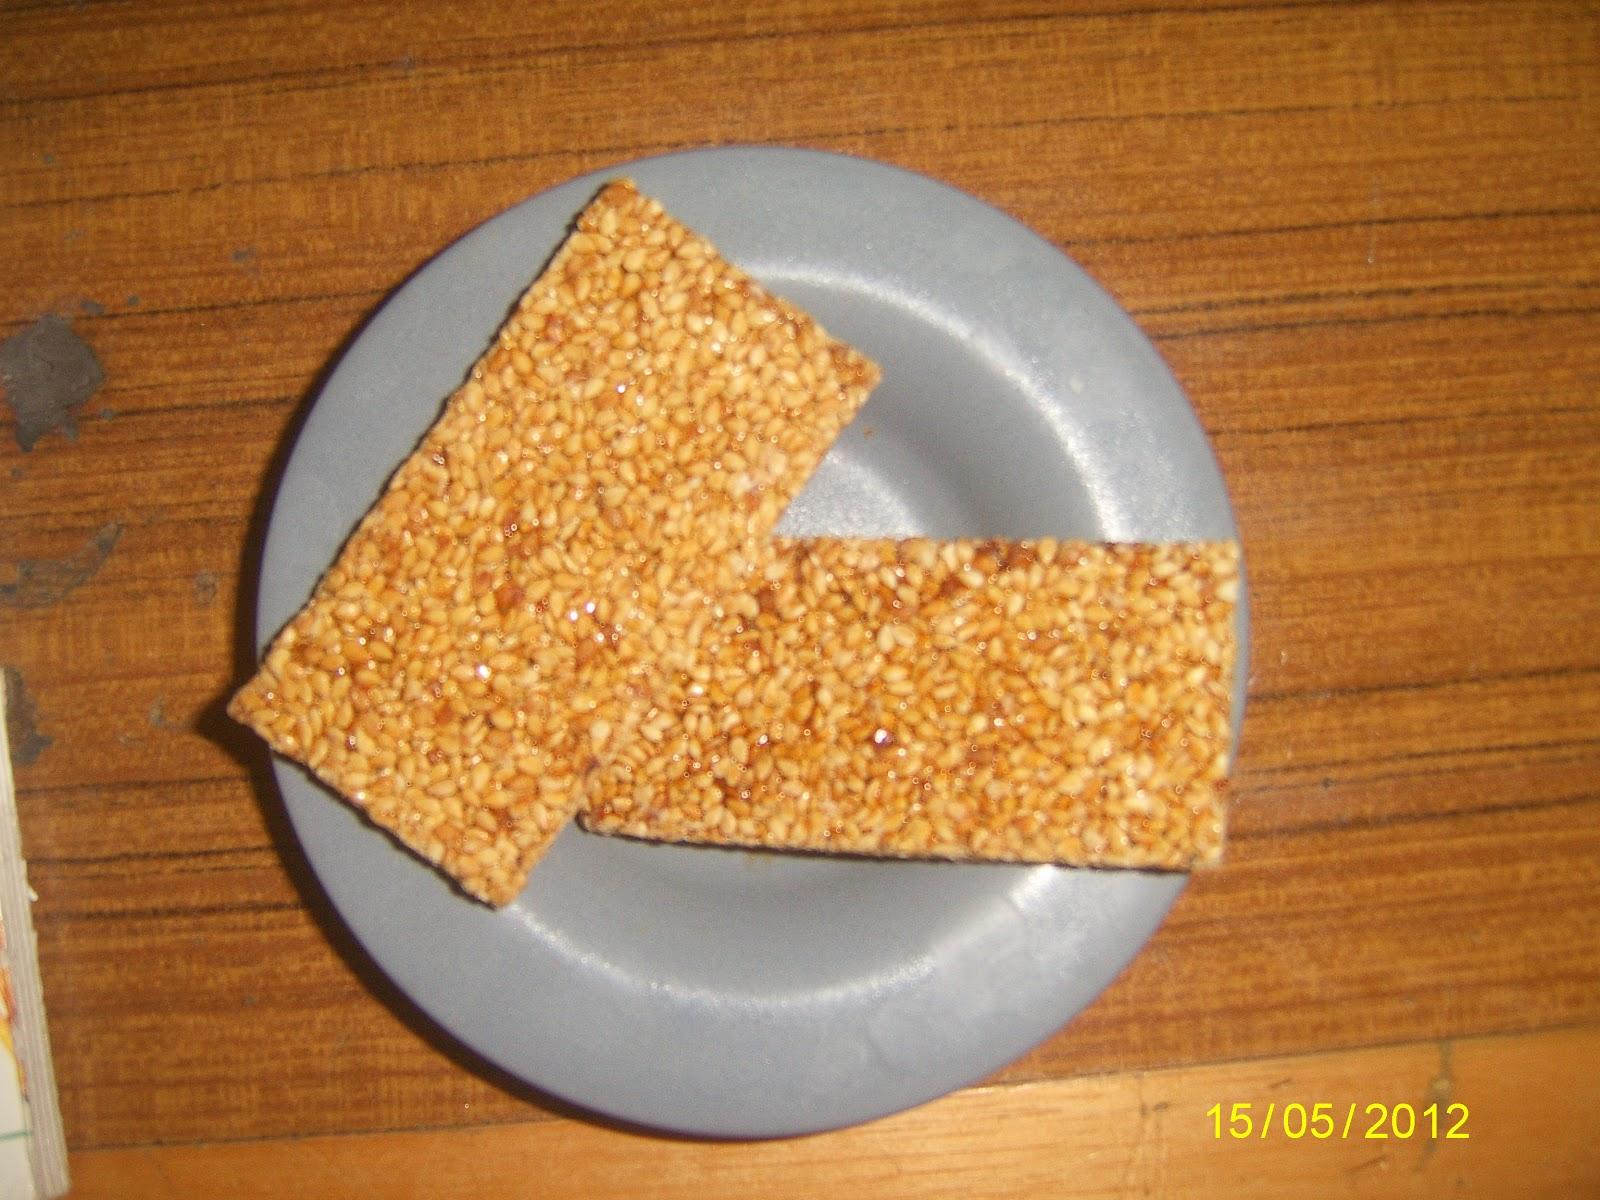 Joyva Sesame Honey Crunch Candy, 1 LB Bag Extra 5% buy ... |Sesame Seed Candy With Cranberries